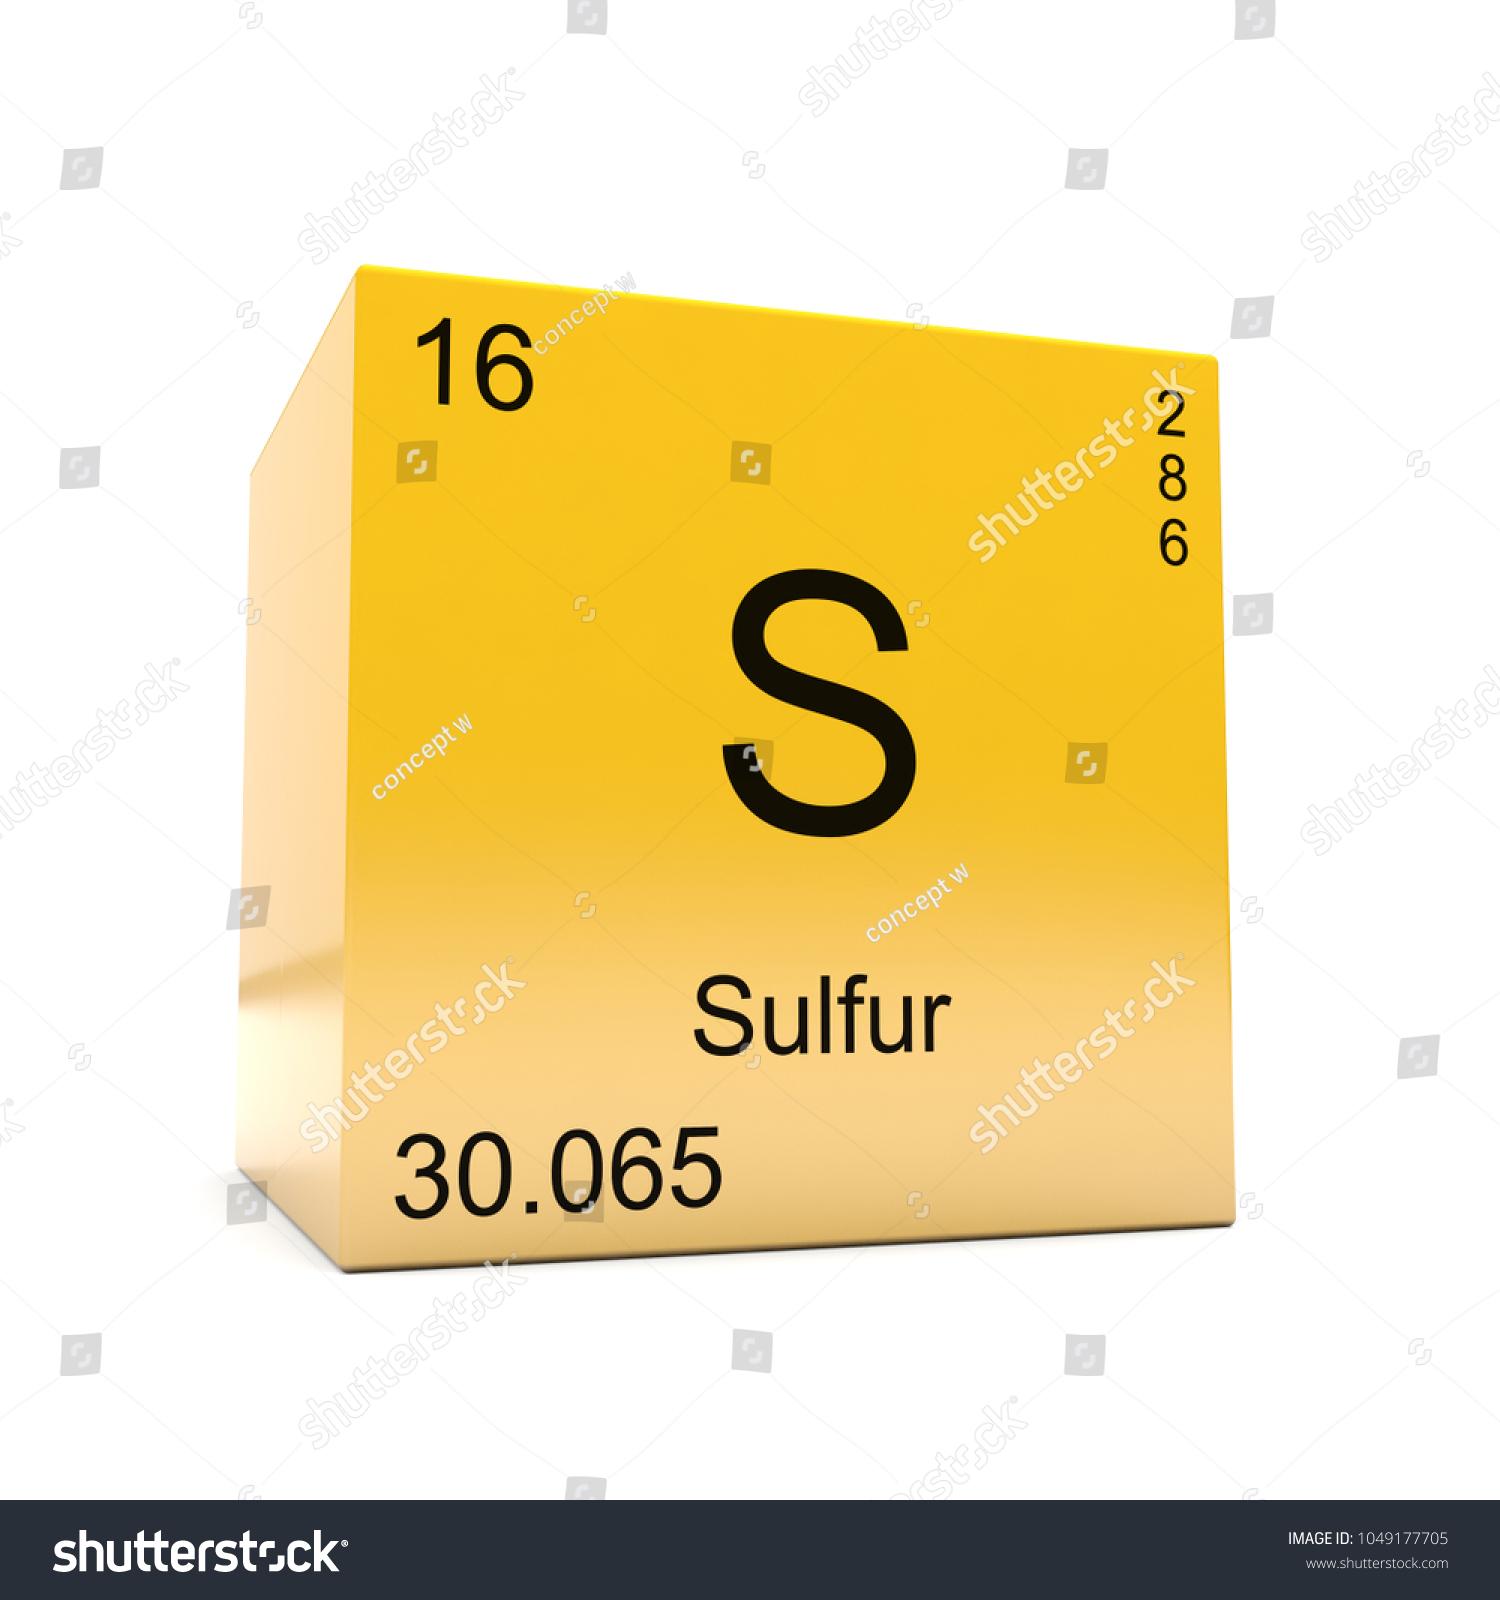 Sulfur Chemical Element Symbol Periodic Table Stock Illustration